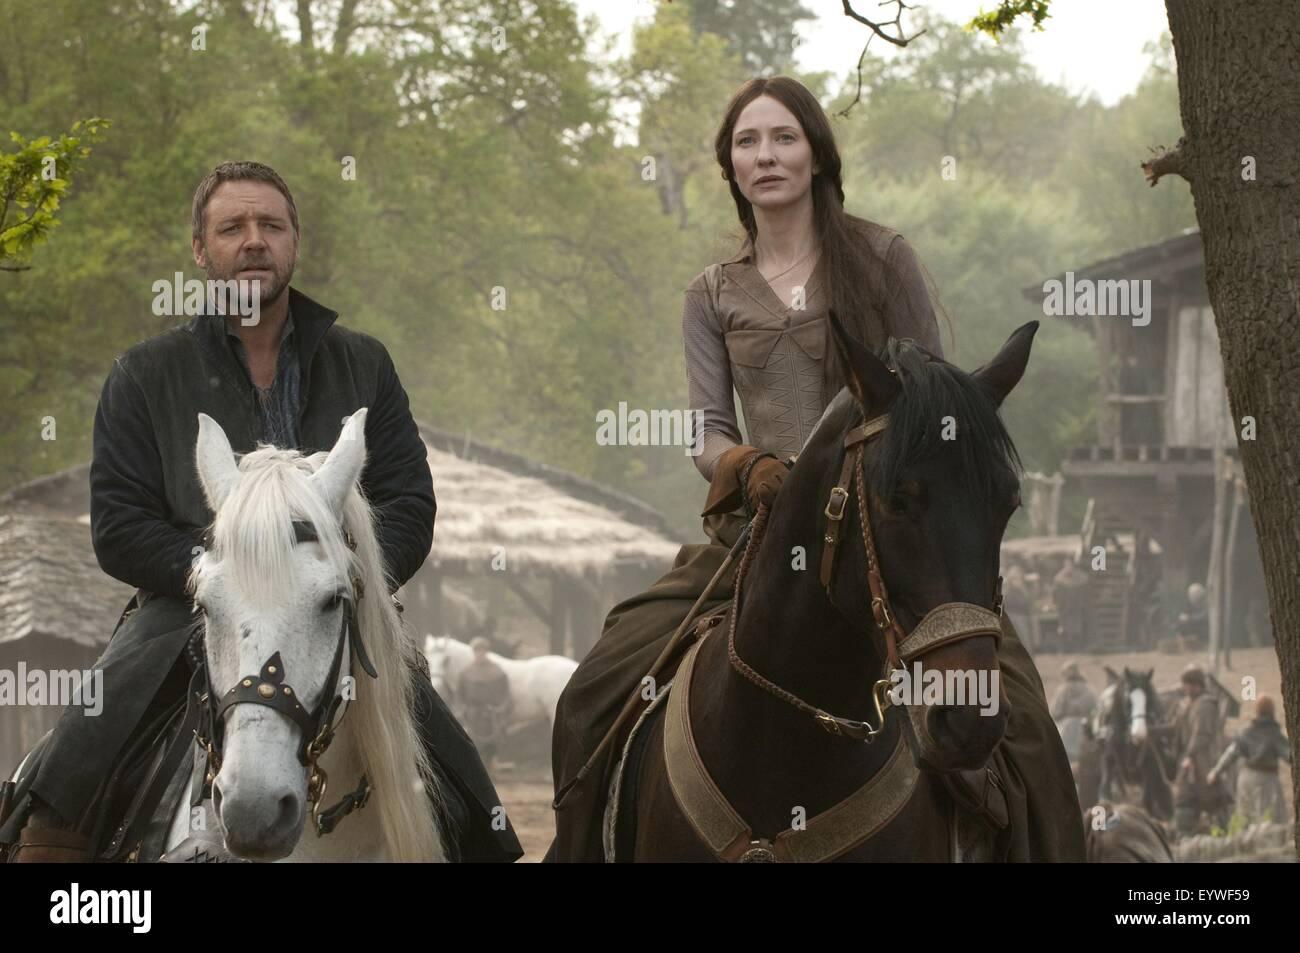 Robin Hood ; Year : 2010 USA ; Director : Ridley Scott ; Russell Crowe. ; Photo: David Appleby - Stock Image